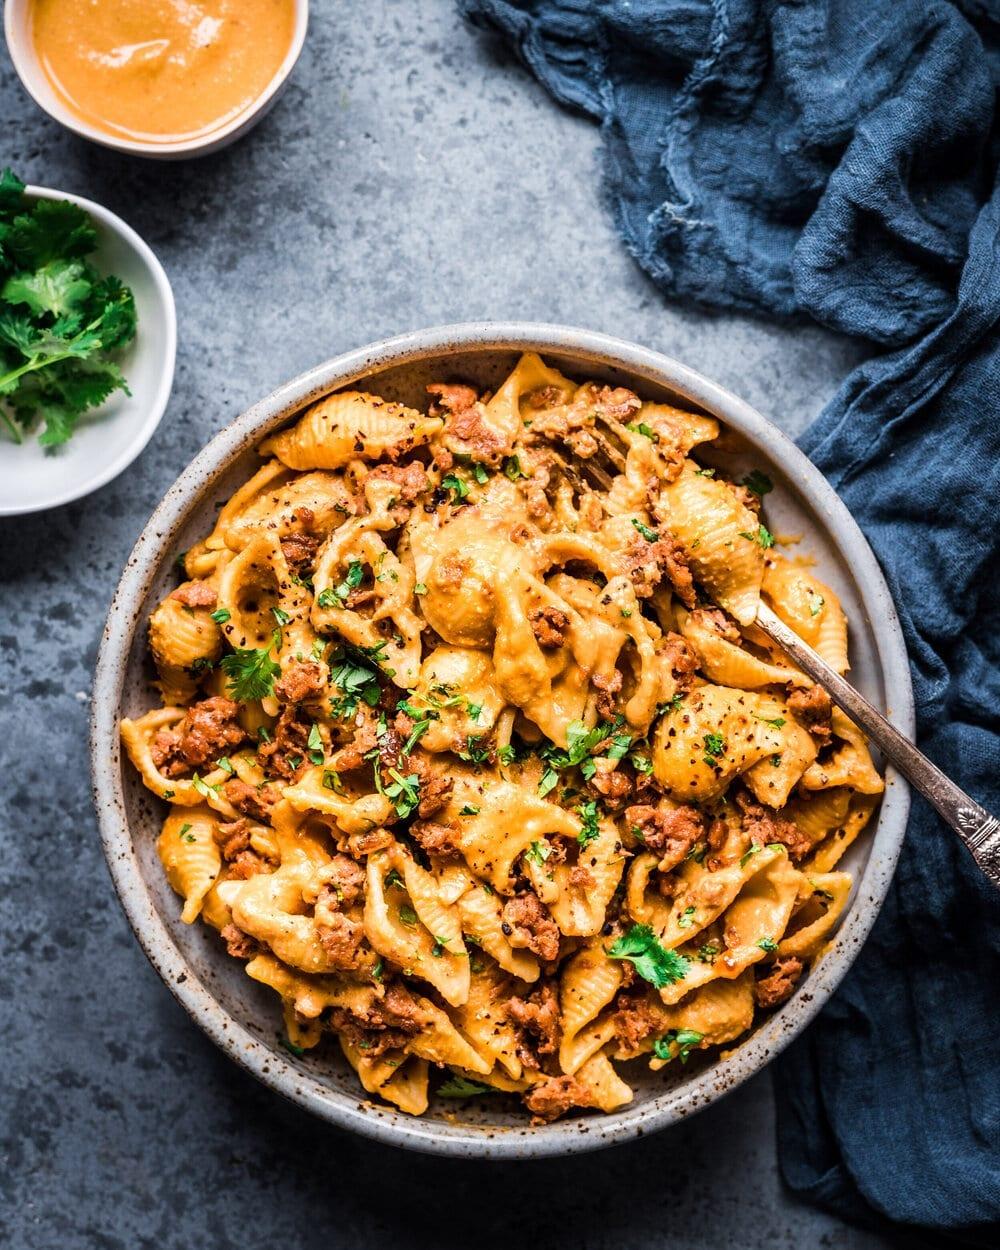 10 Creamy Vegan Pasta Recipes. creamy chipotle pasta. sweet potato pasta. vegan sweet potato pasta.